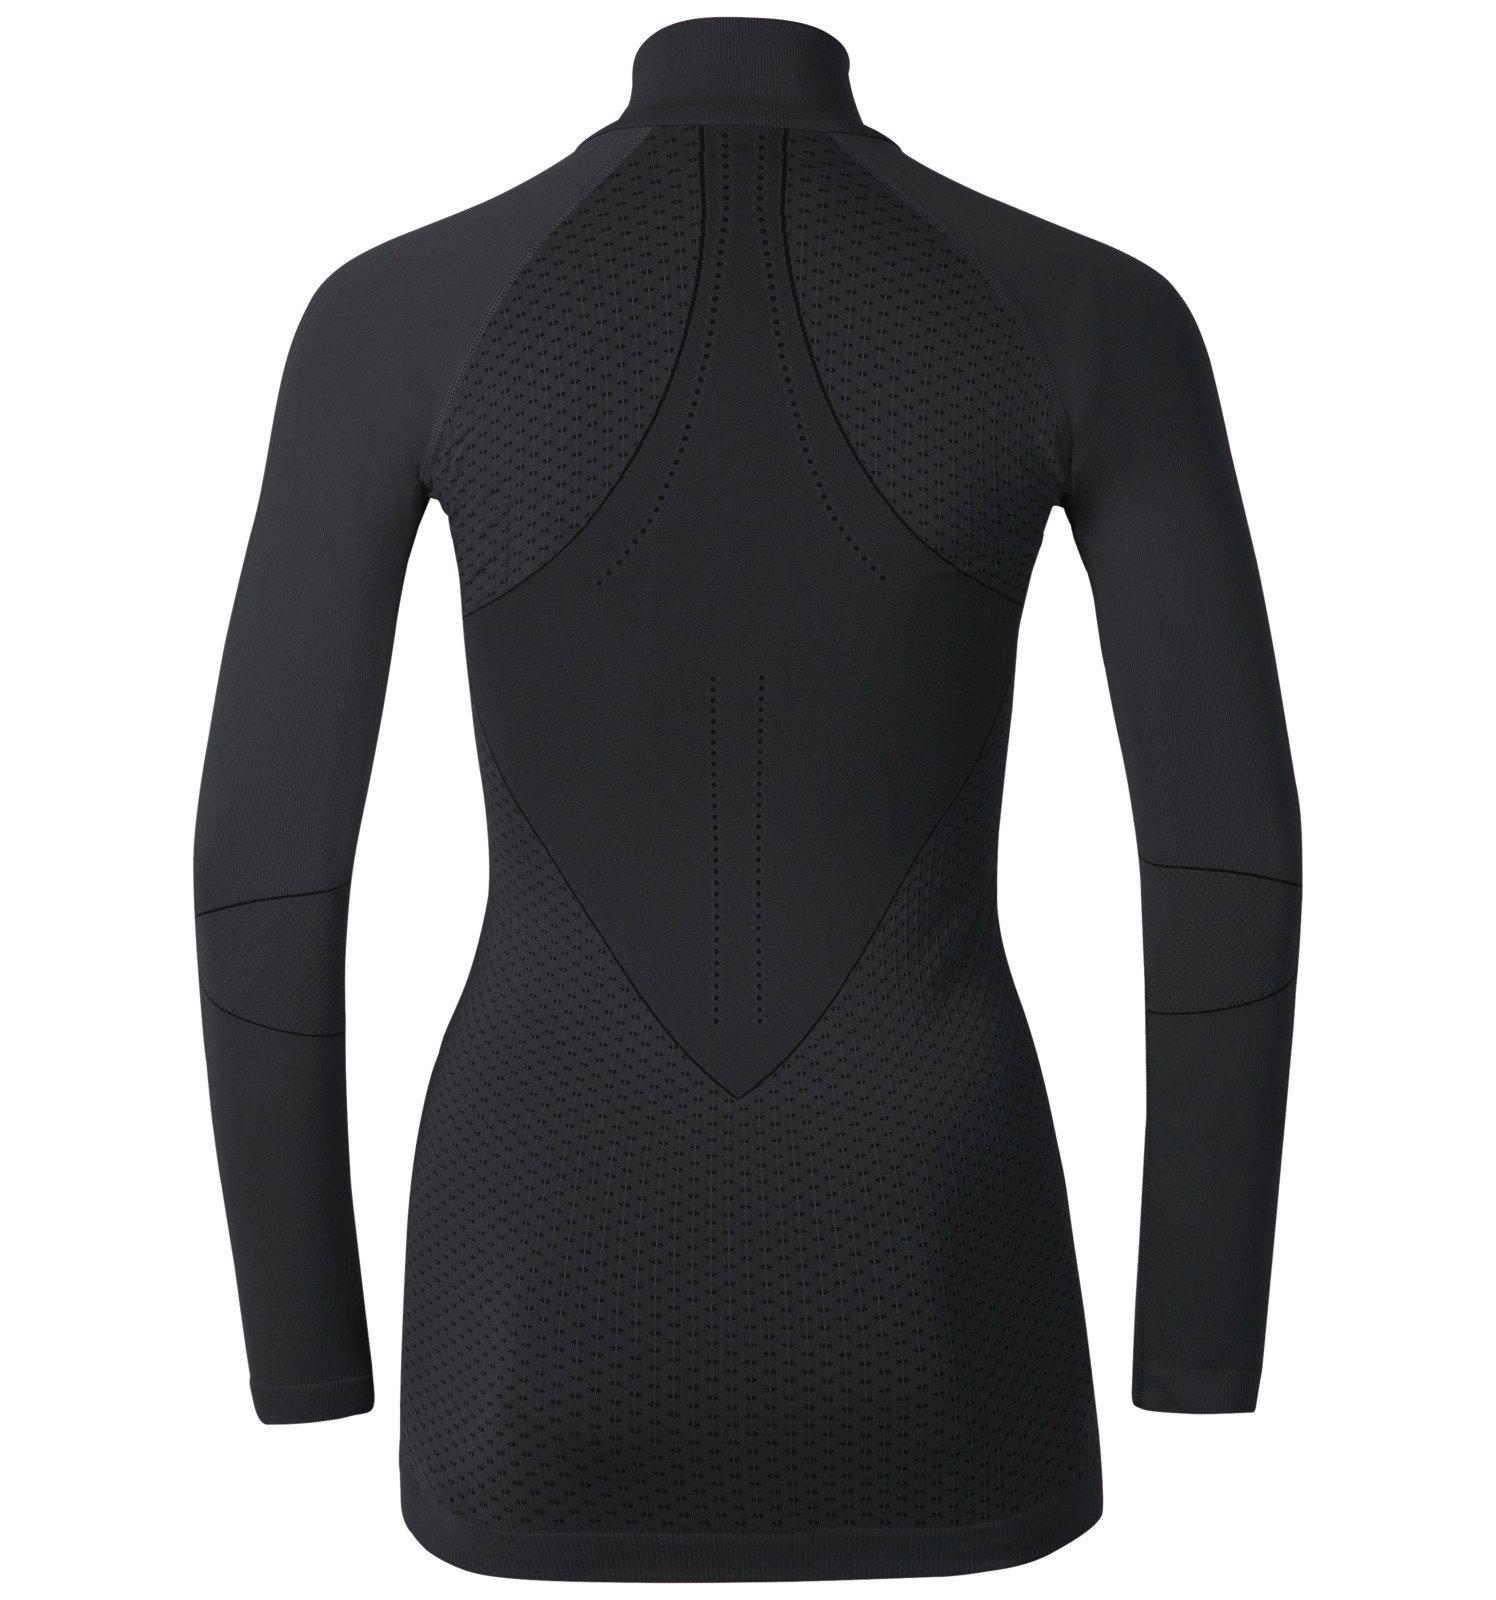 ODLO Women's Evolution Long Sleeve top